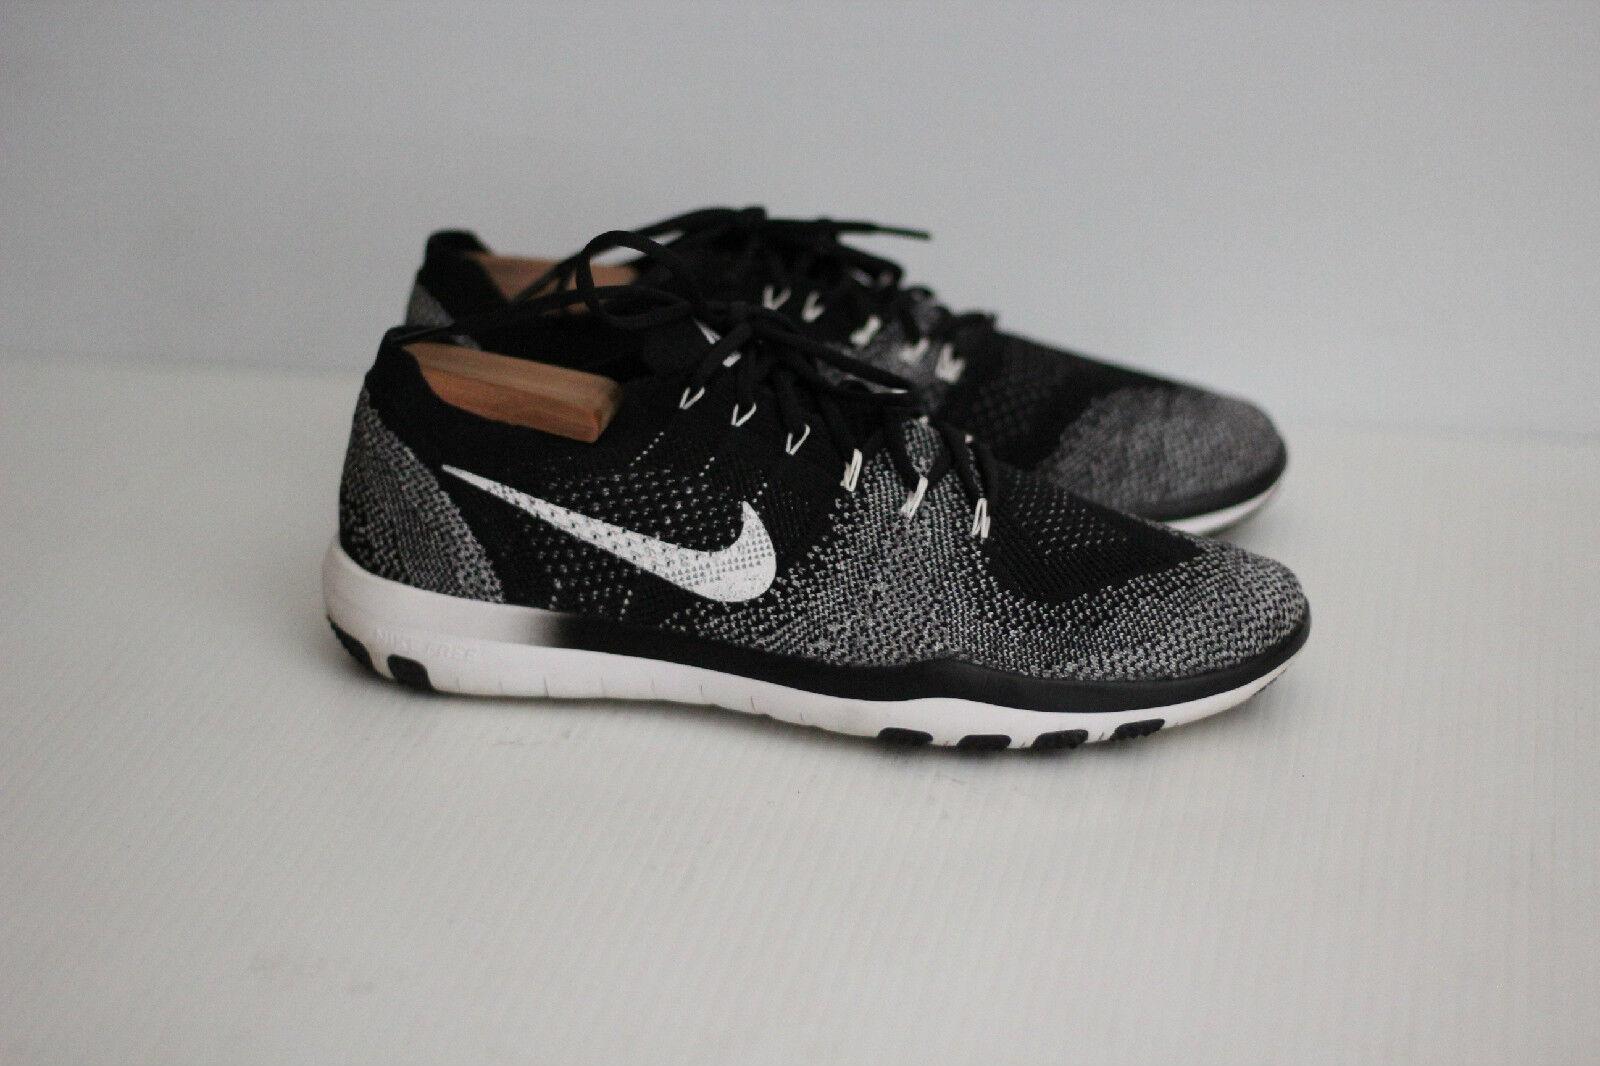 13718f03a0929 Nike Free Focus Flyknit 2 2 2 Training Shoe - Black   White - Size 11.5US  (C36) 473d19